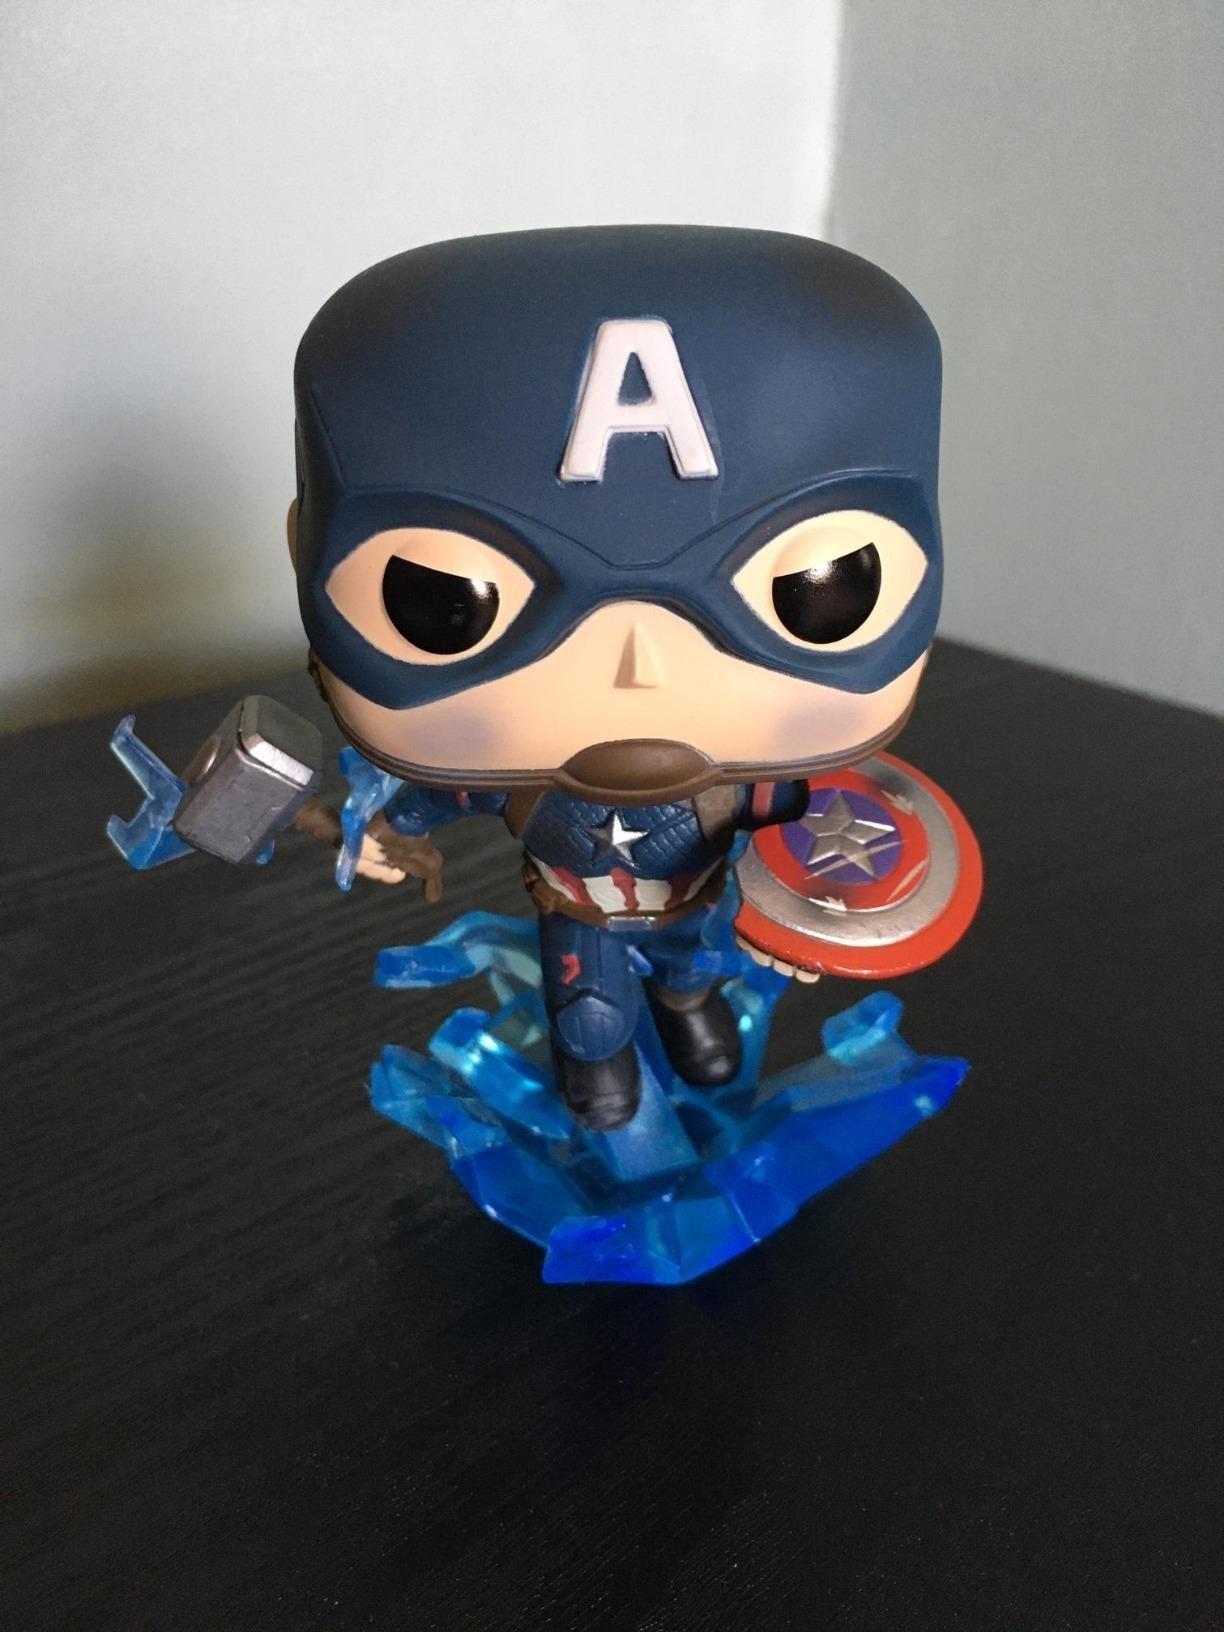 Captain America Funko Pop on table